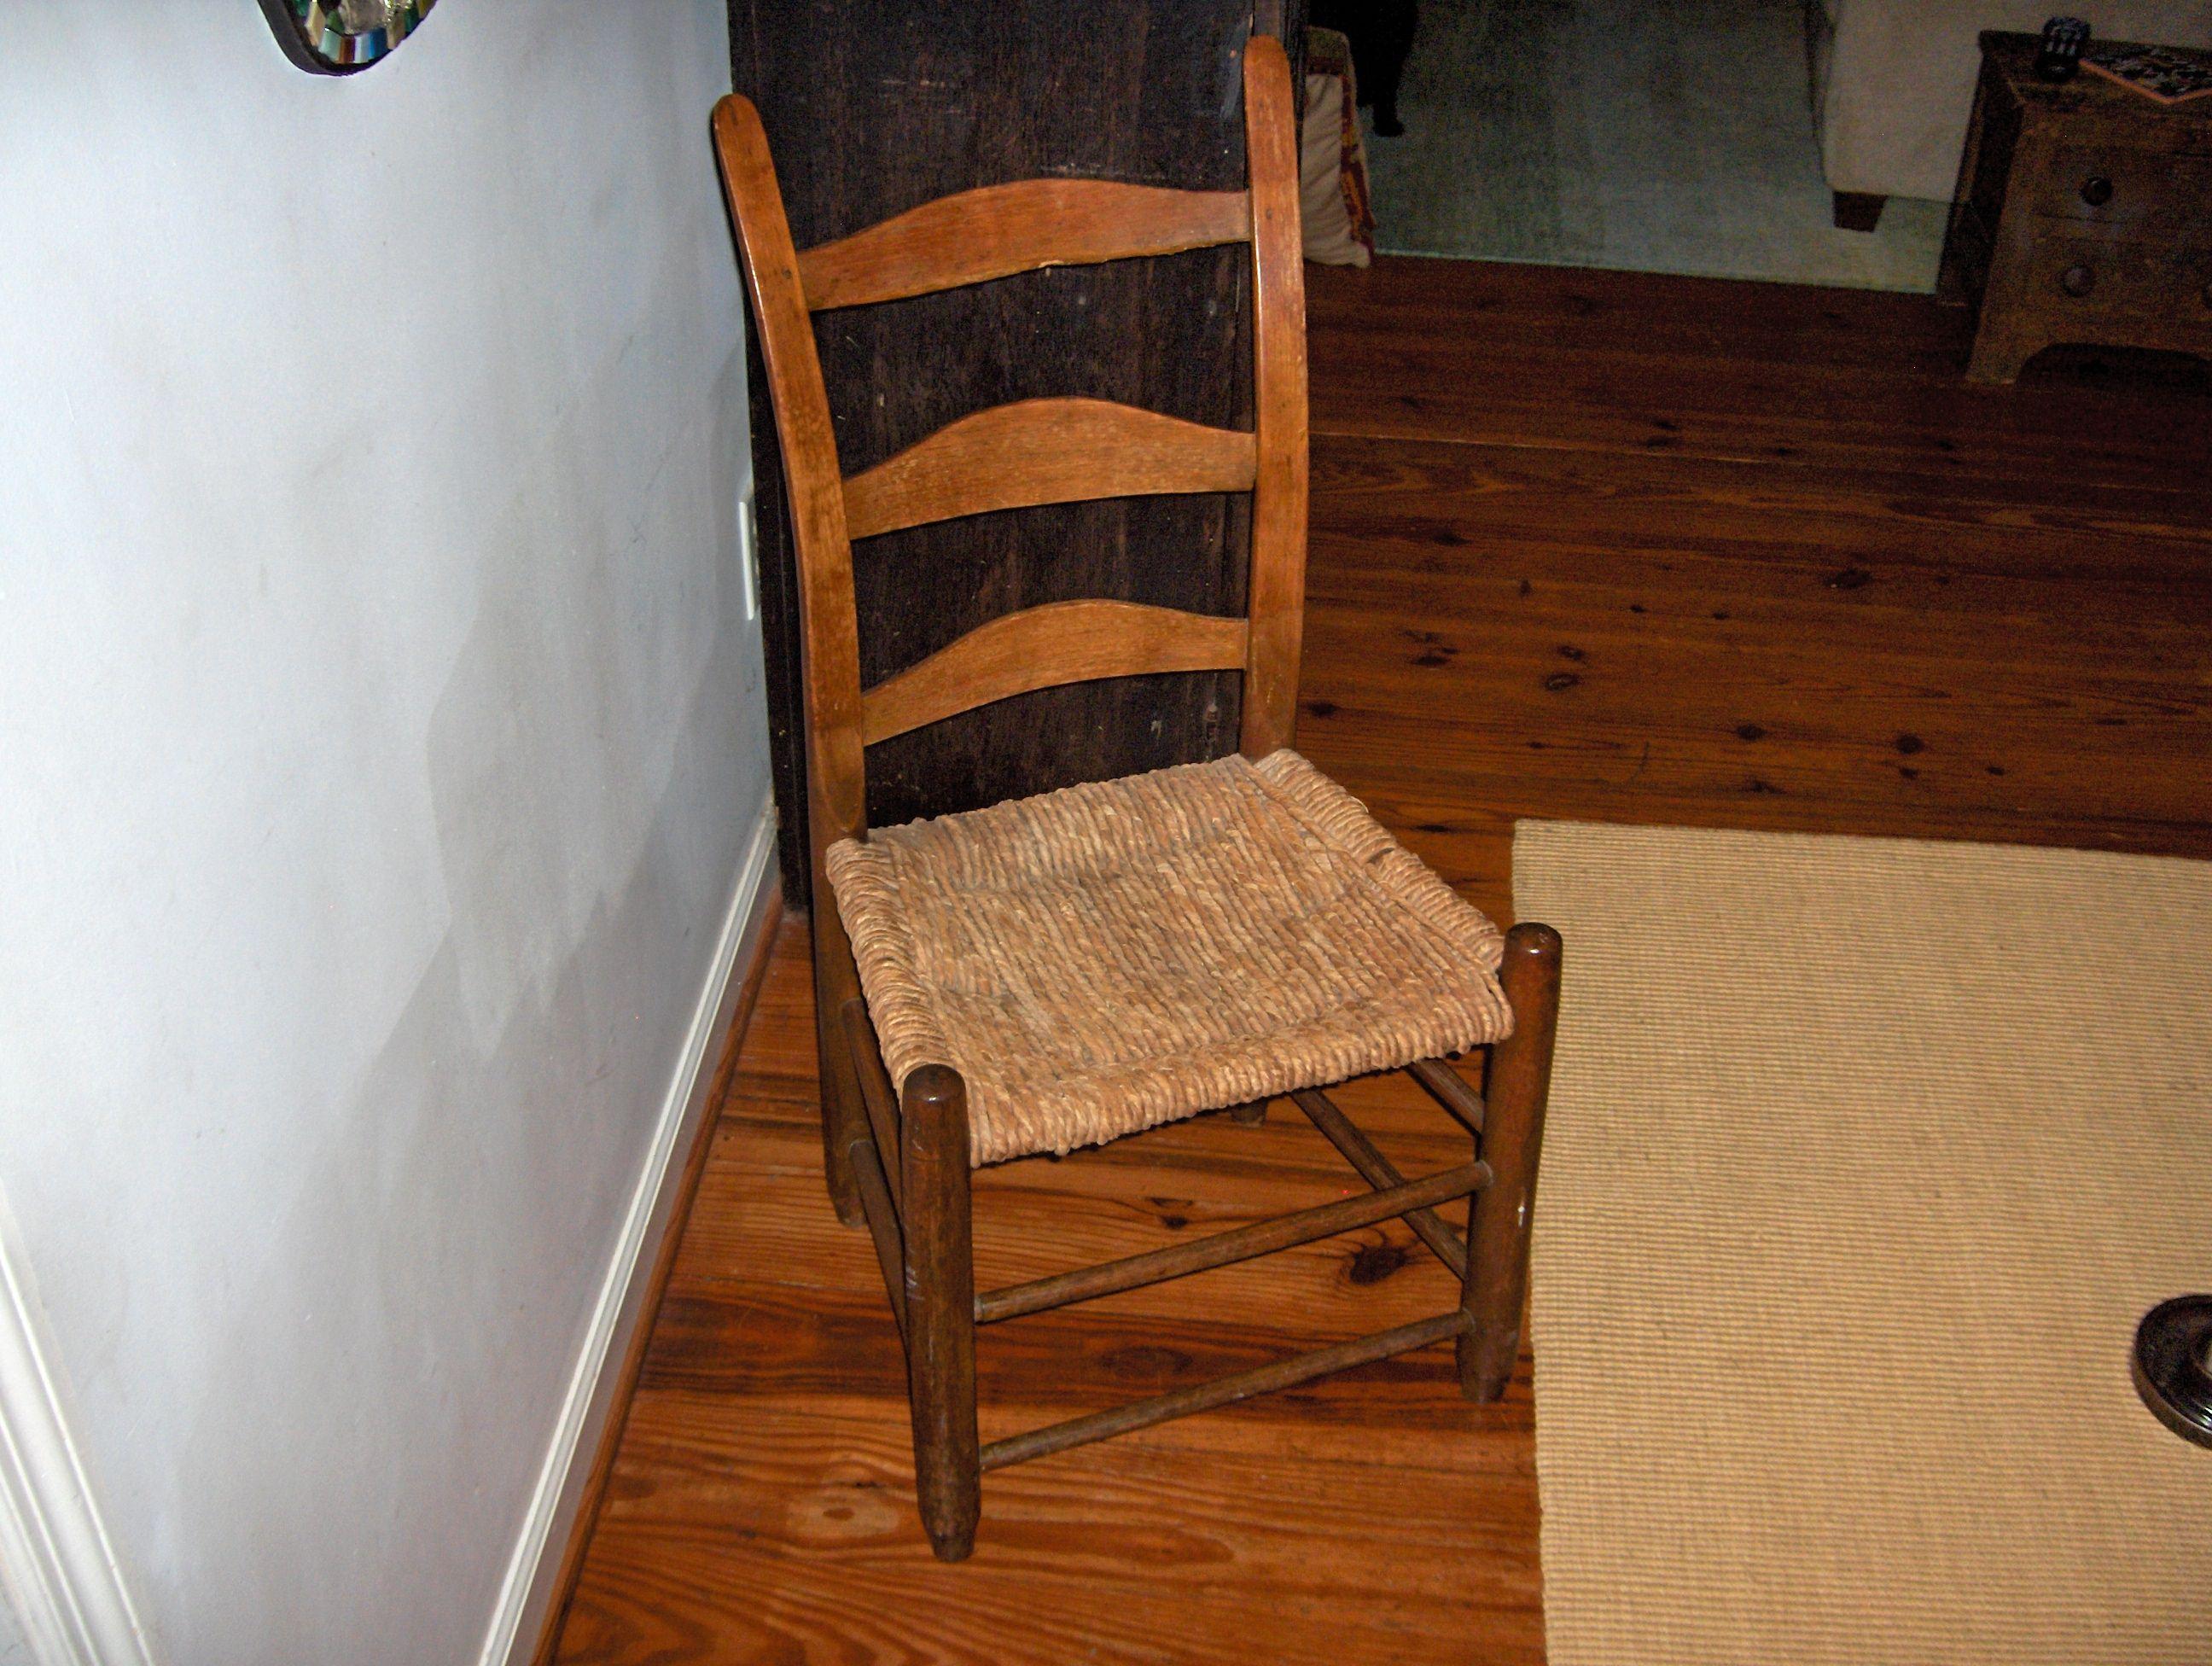 tennessee chair, cornshuck bottom, single peg in the top slat